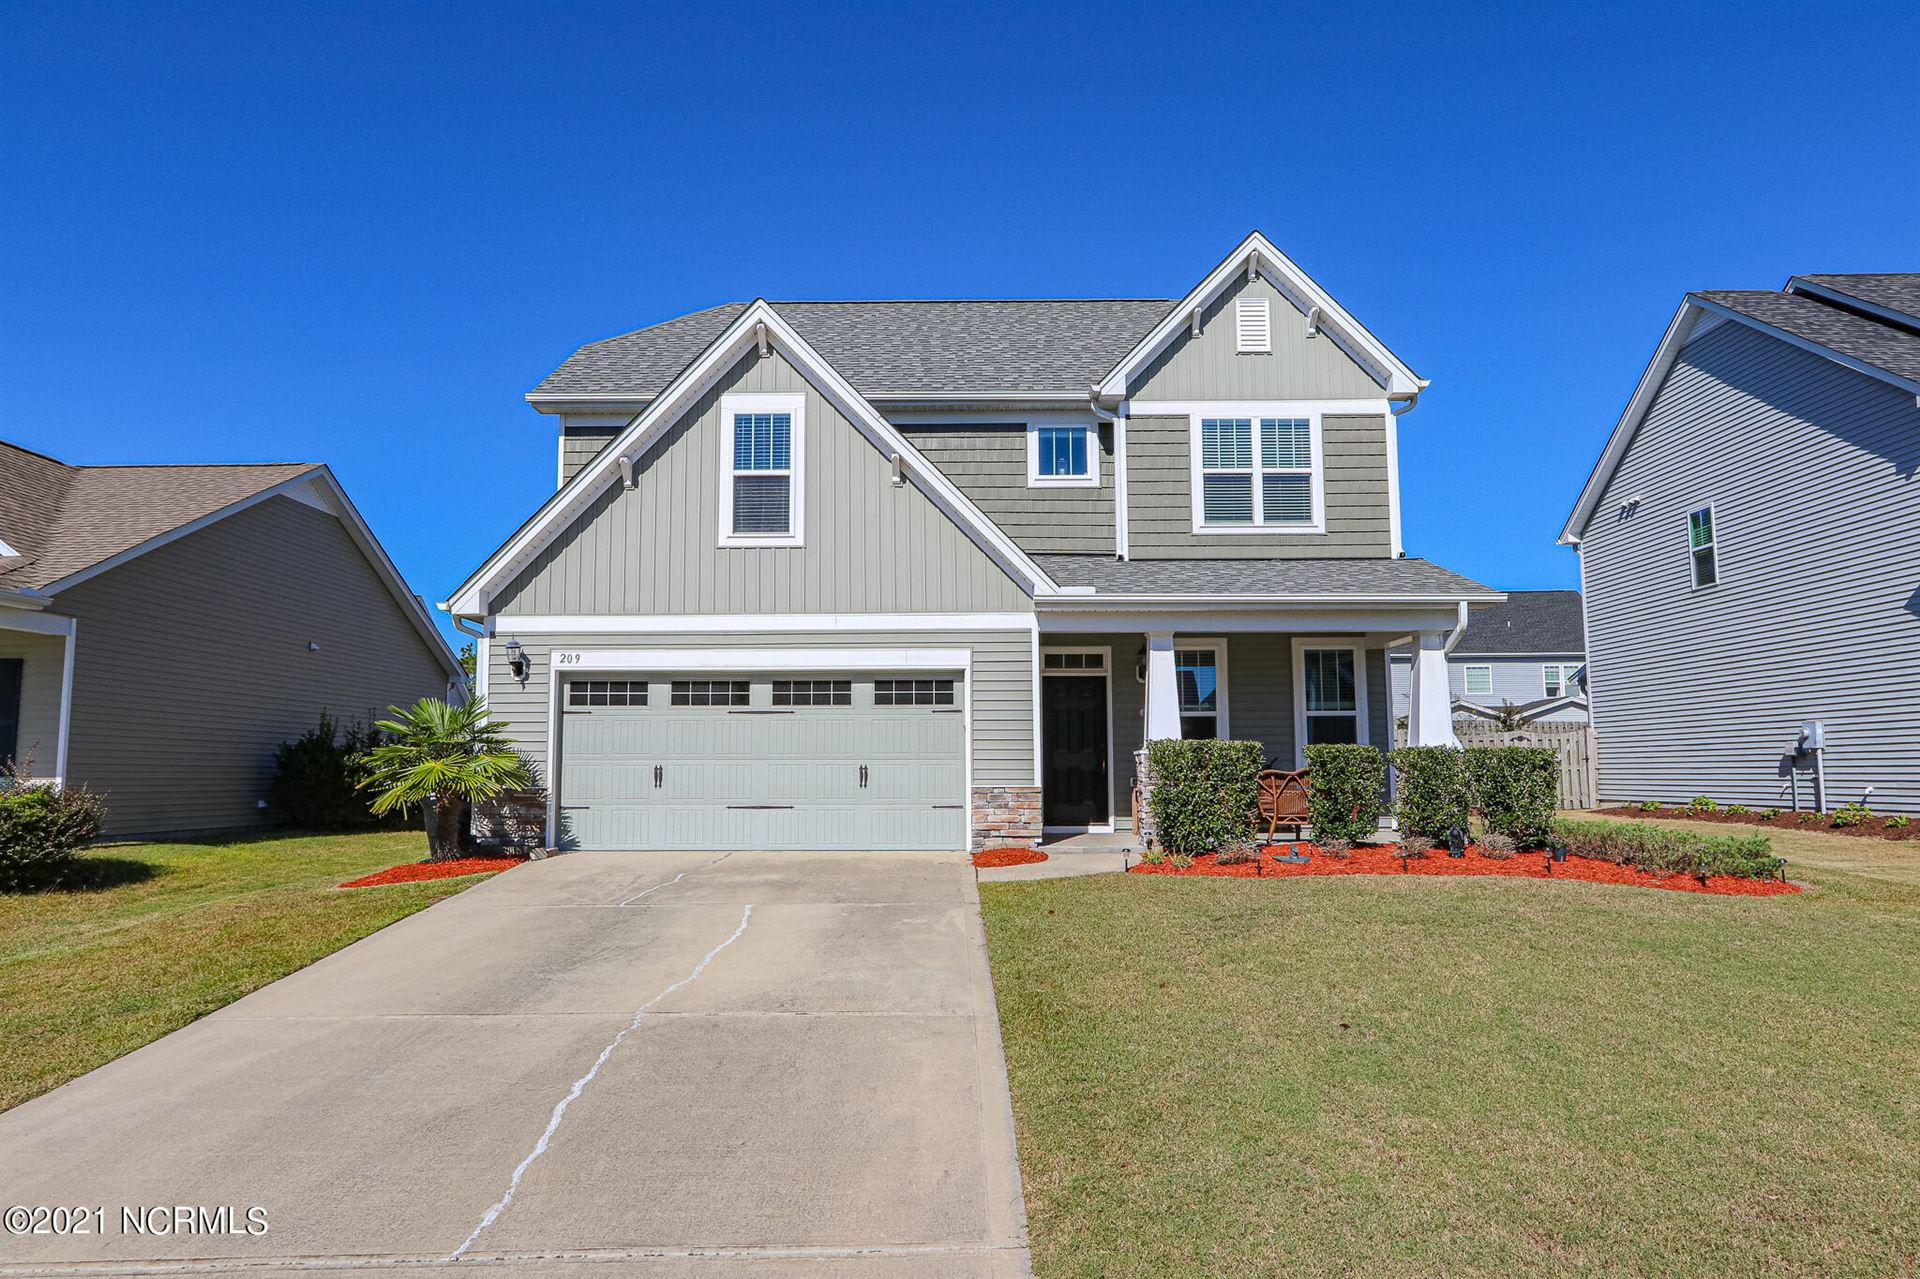 Photo of 209 Willow Ridge Drive, Holly Ridge, NC 28445 (MLS # 100295576)